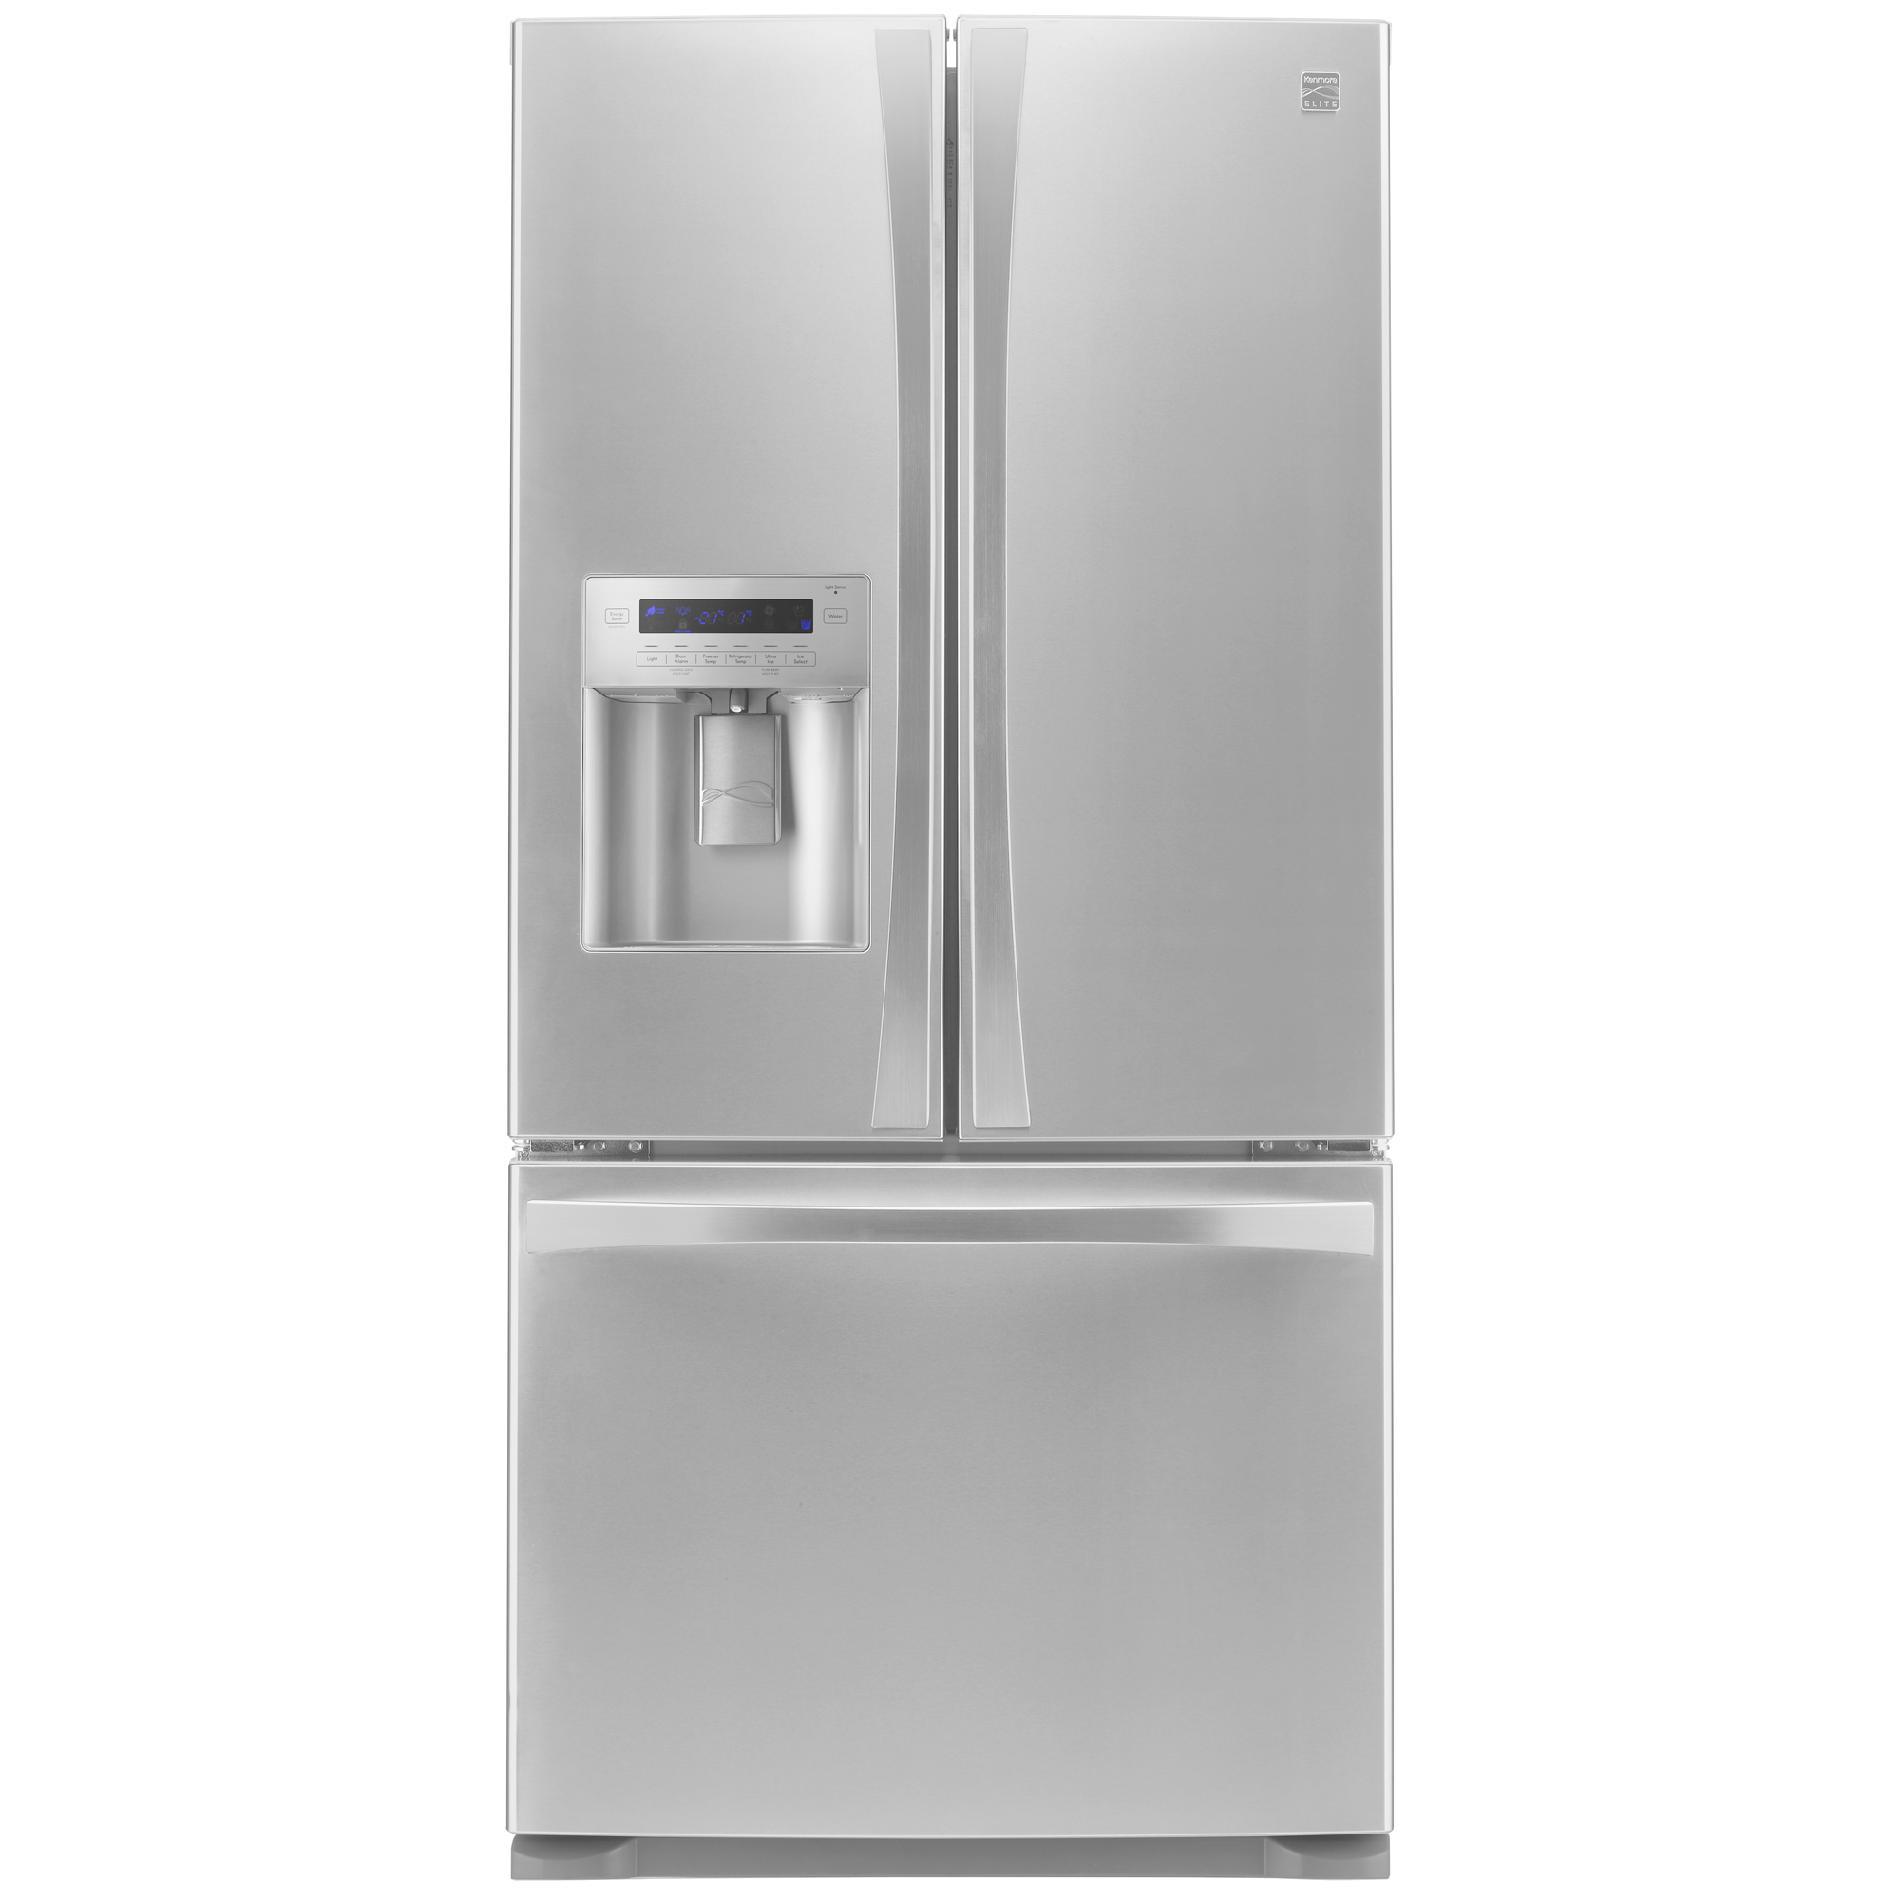 How To Level A Kenmore Refrigerator Kenmore Elite Refrigerator Enervee Score 65 100 73133